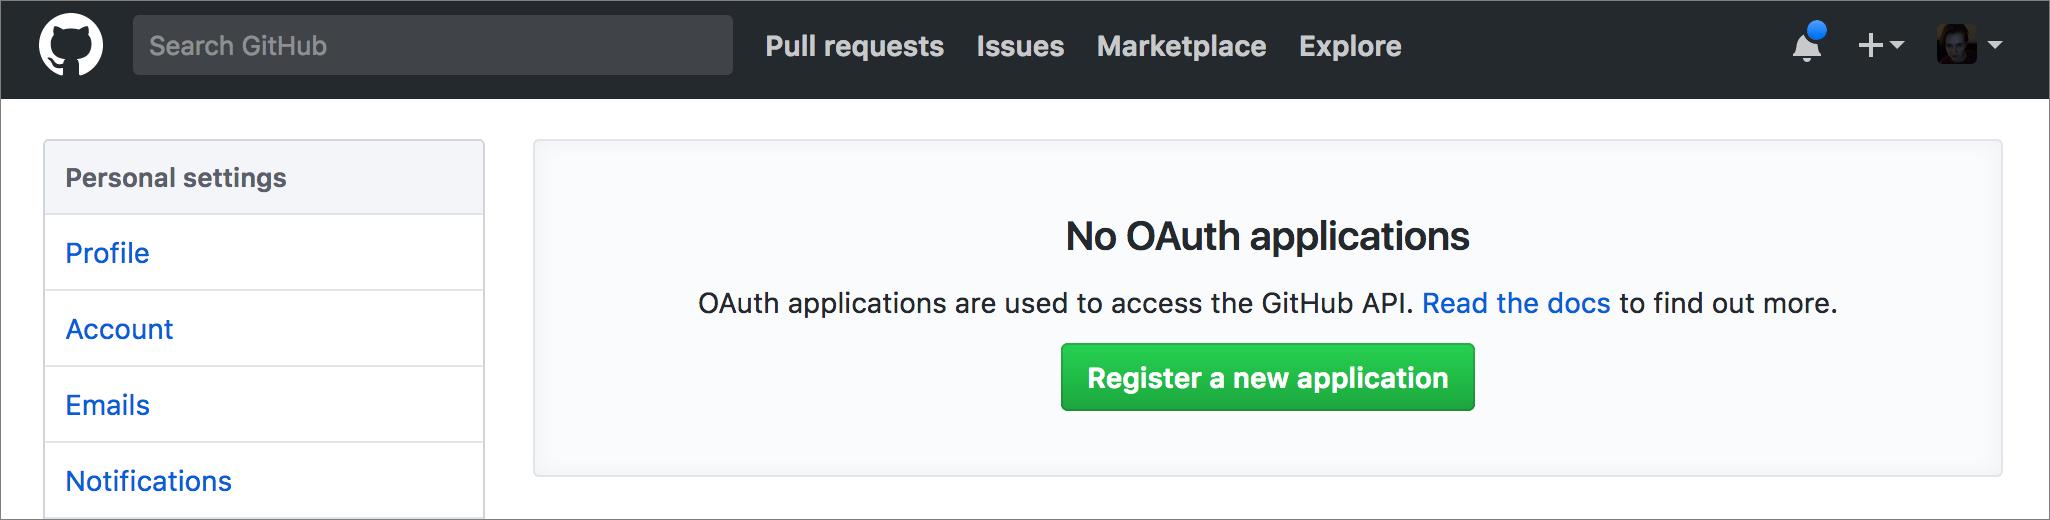 Log the User into GitHub - Dropsource Help Center